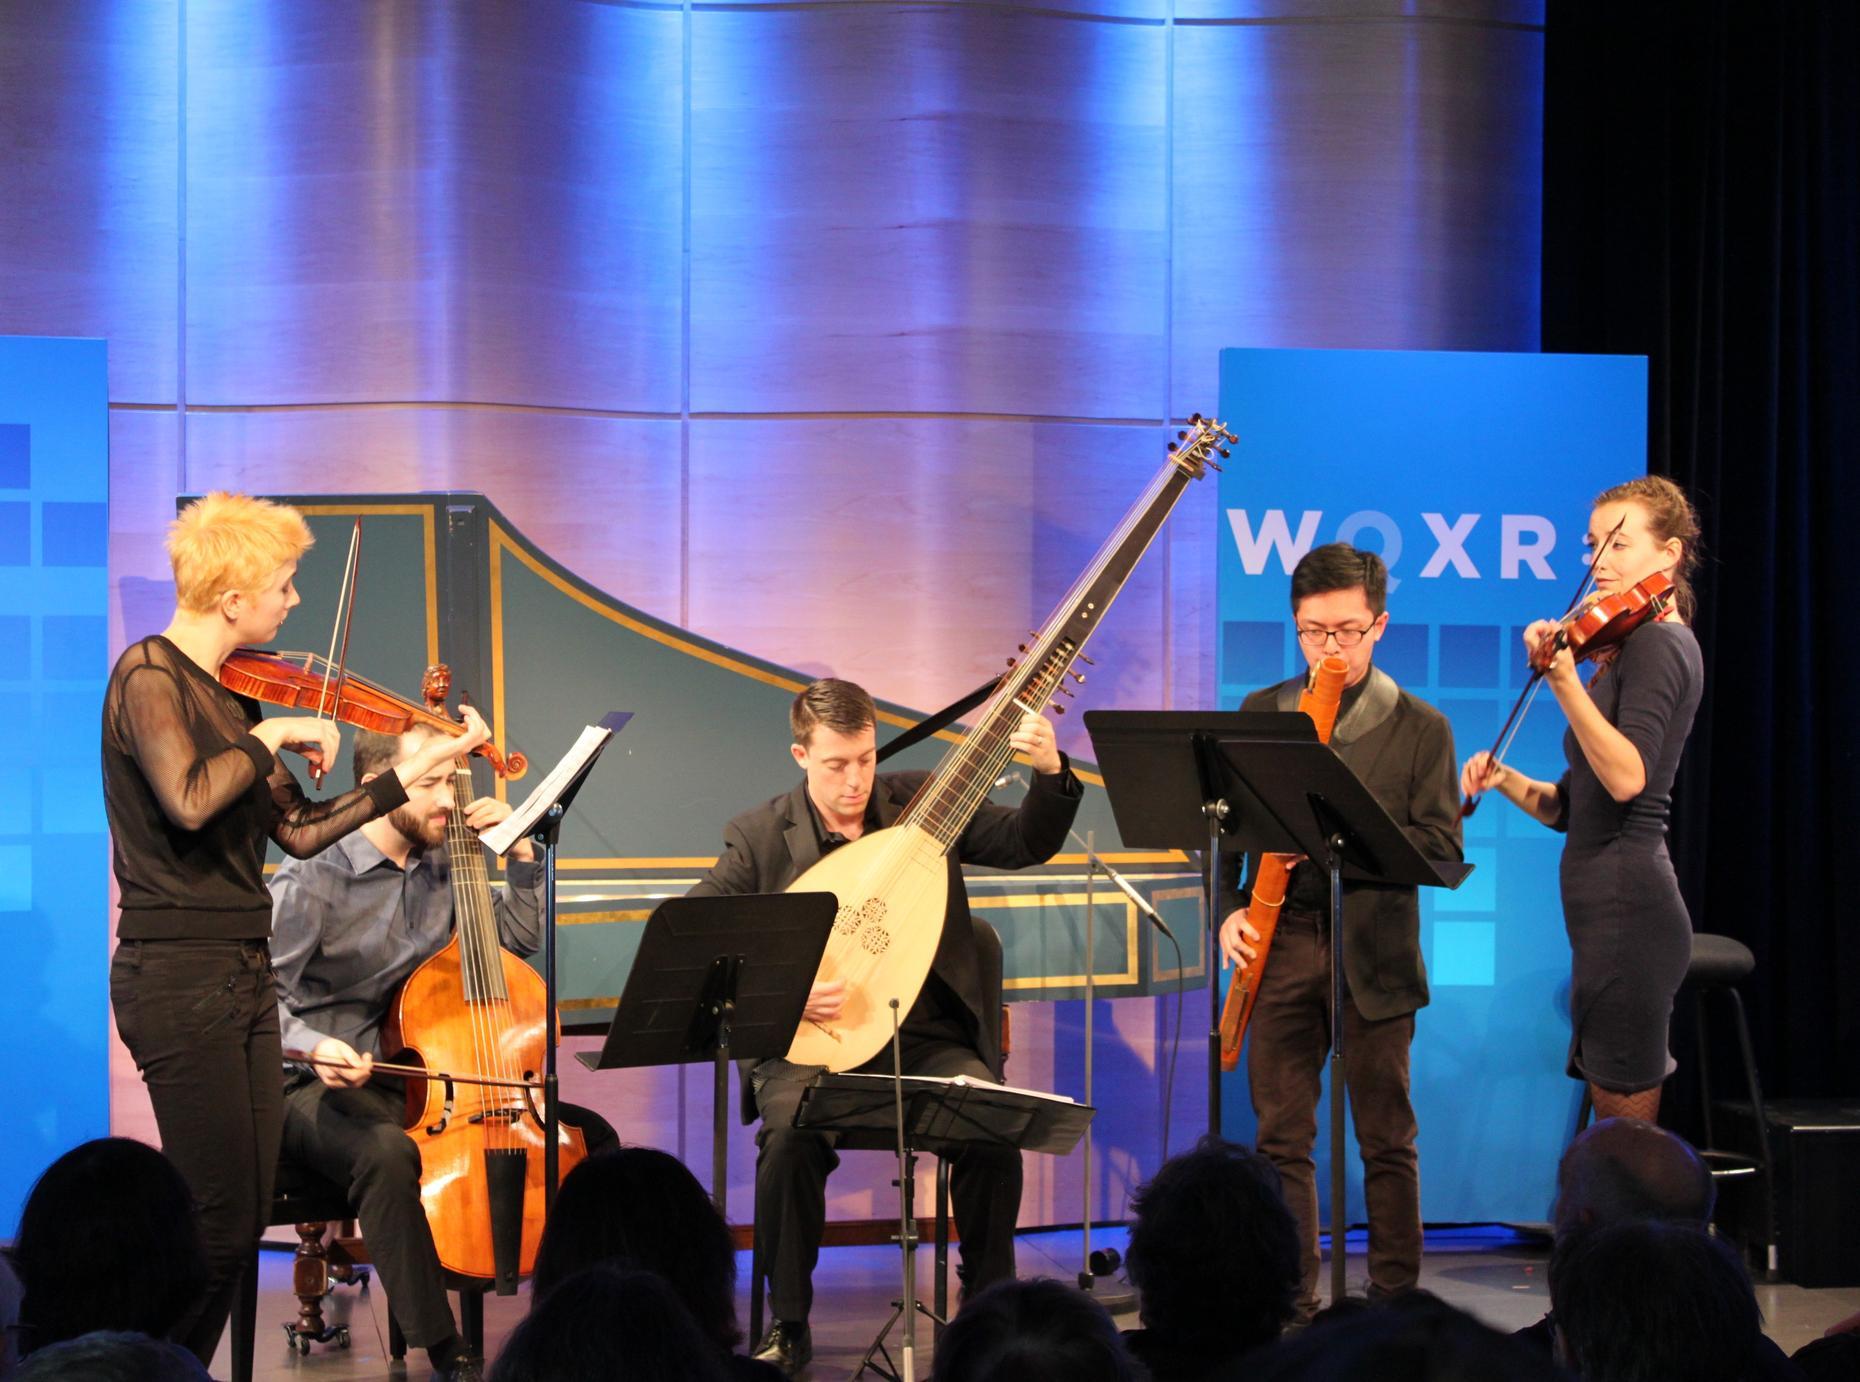 WQXR's Midday Masterpieces: Musicians From Juilliard's Historical Performance Program